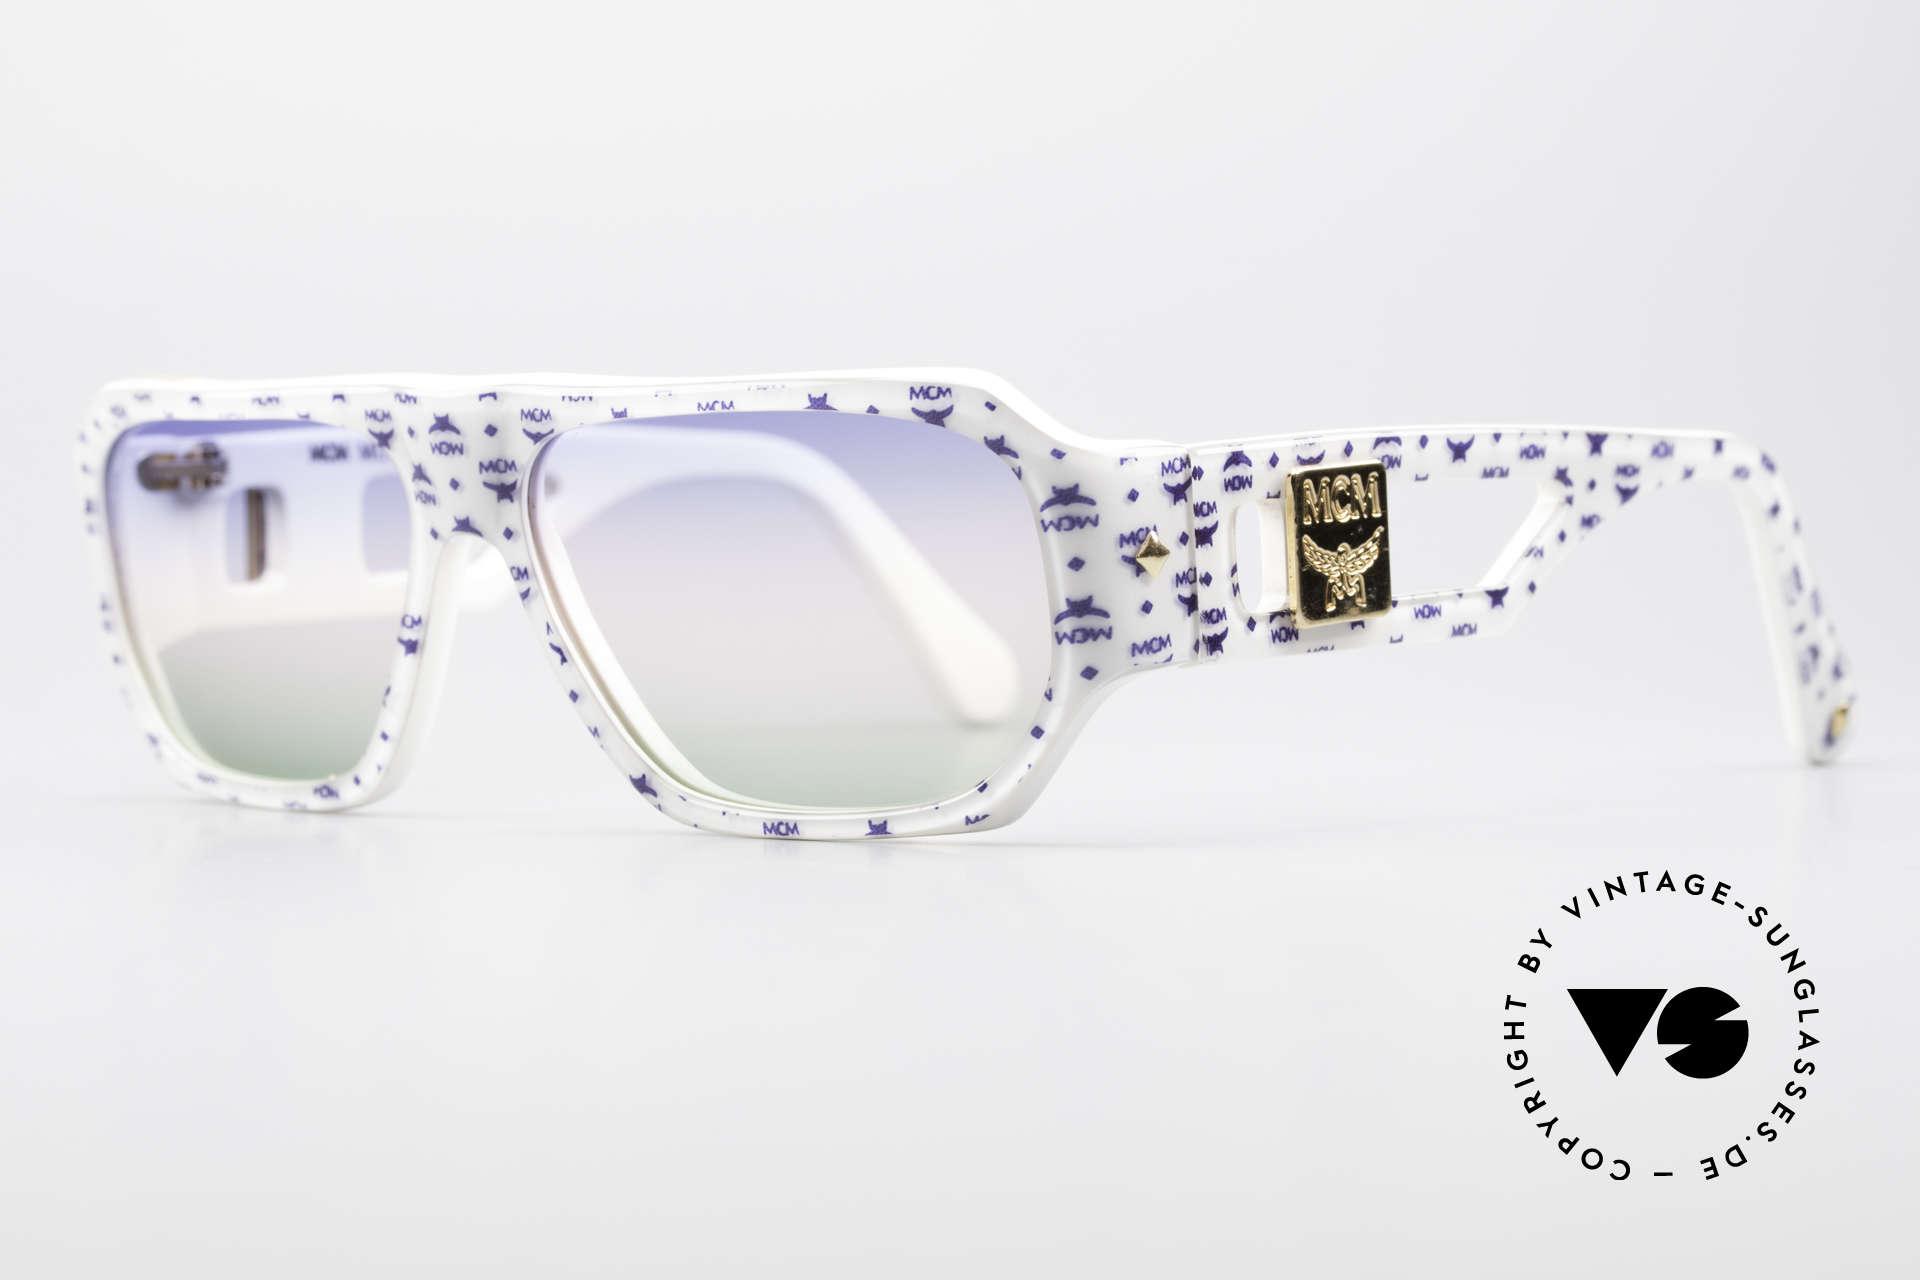 MCM München A2 Rare 80's Designer Sunglasses, massive frame & convincing quality (handmade), Made for Men and Women